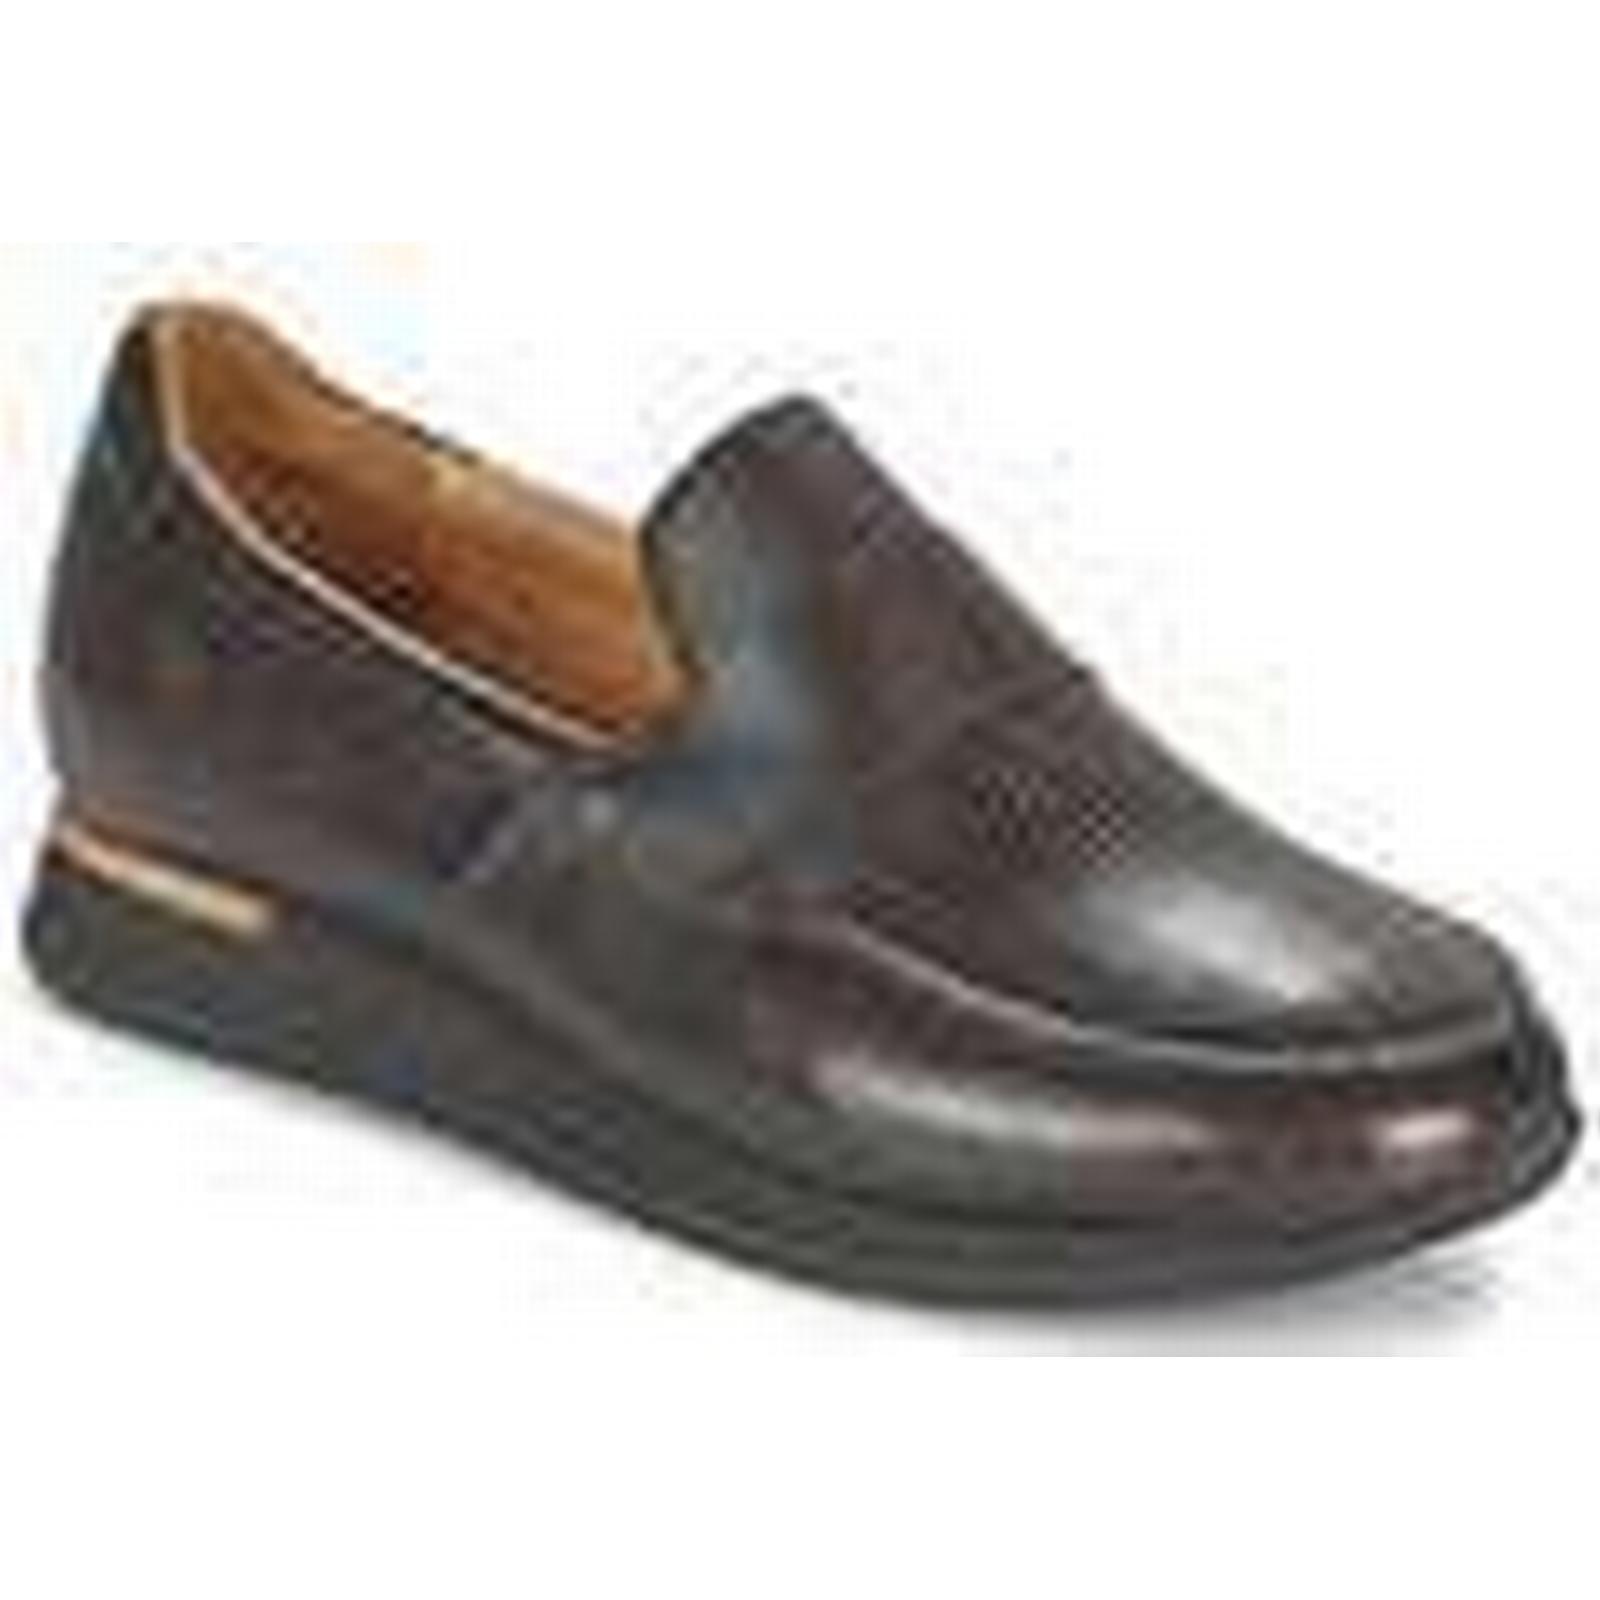 Fred de la OFF Bretoniere  ROSA BRUSH OFF la  women's Loafers / Casual Shoes in Brown 8ccd13